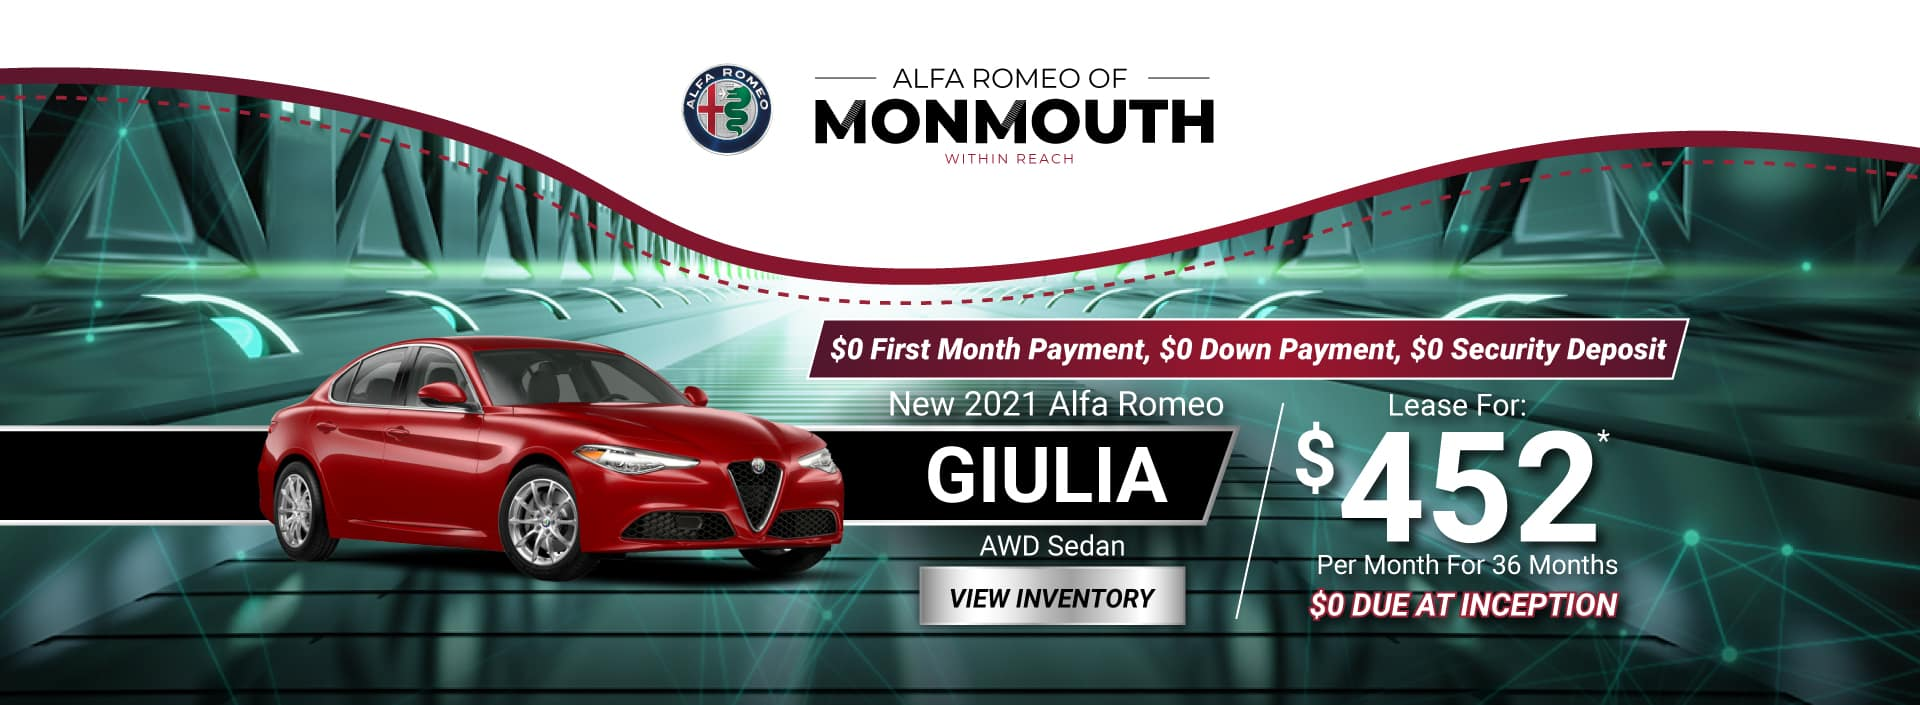 New 2021 Alfa Romeo Giulia AWD Sedan Lease for $452* Per Month for 36 months